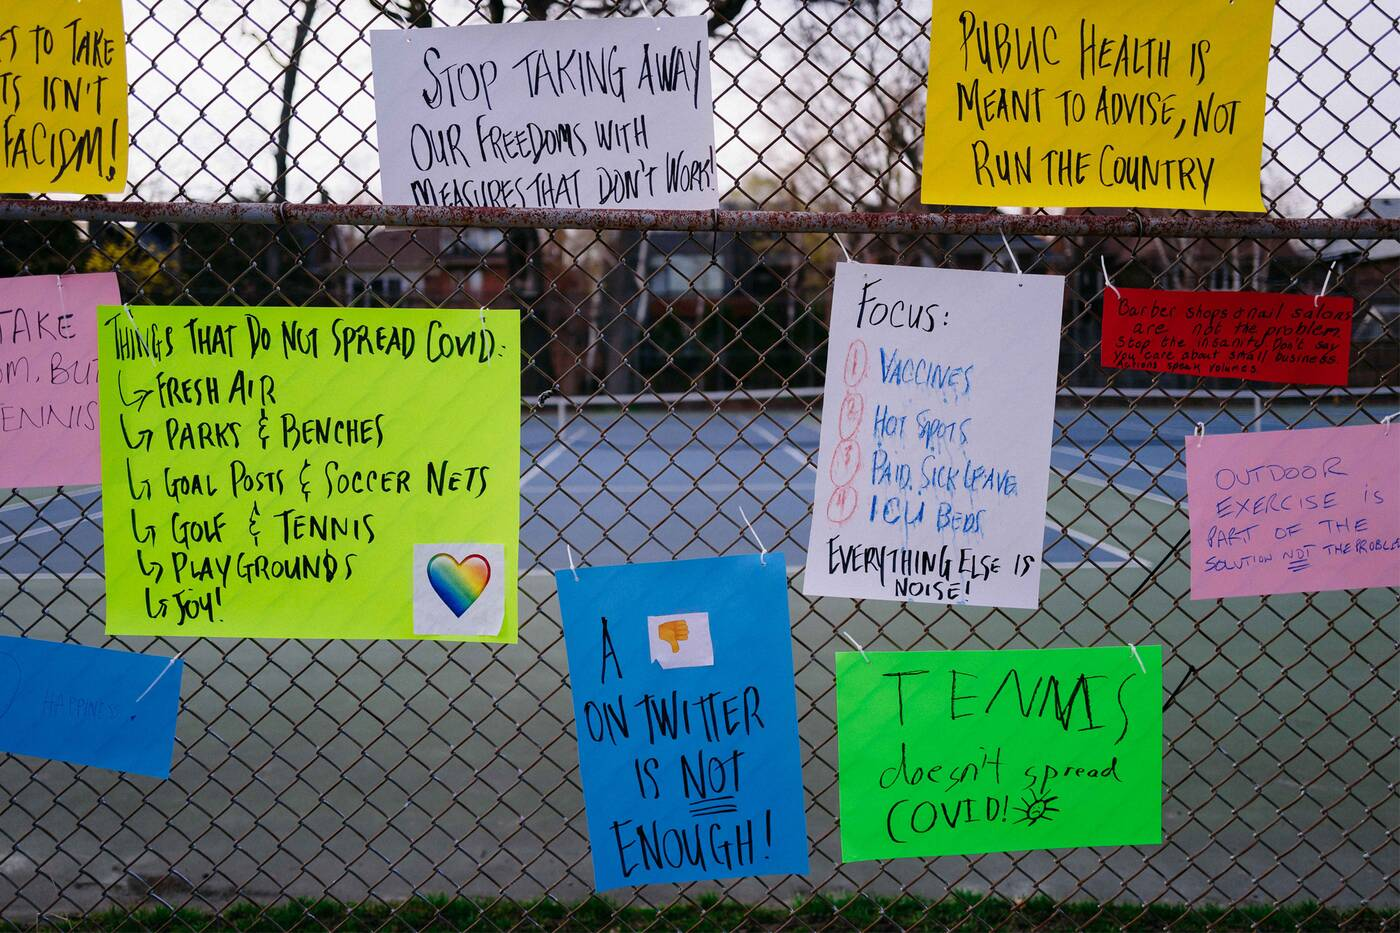 toronto park protest lockdown covid